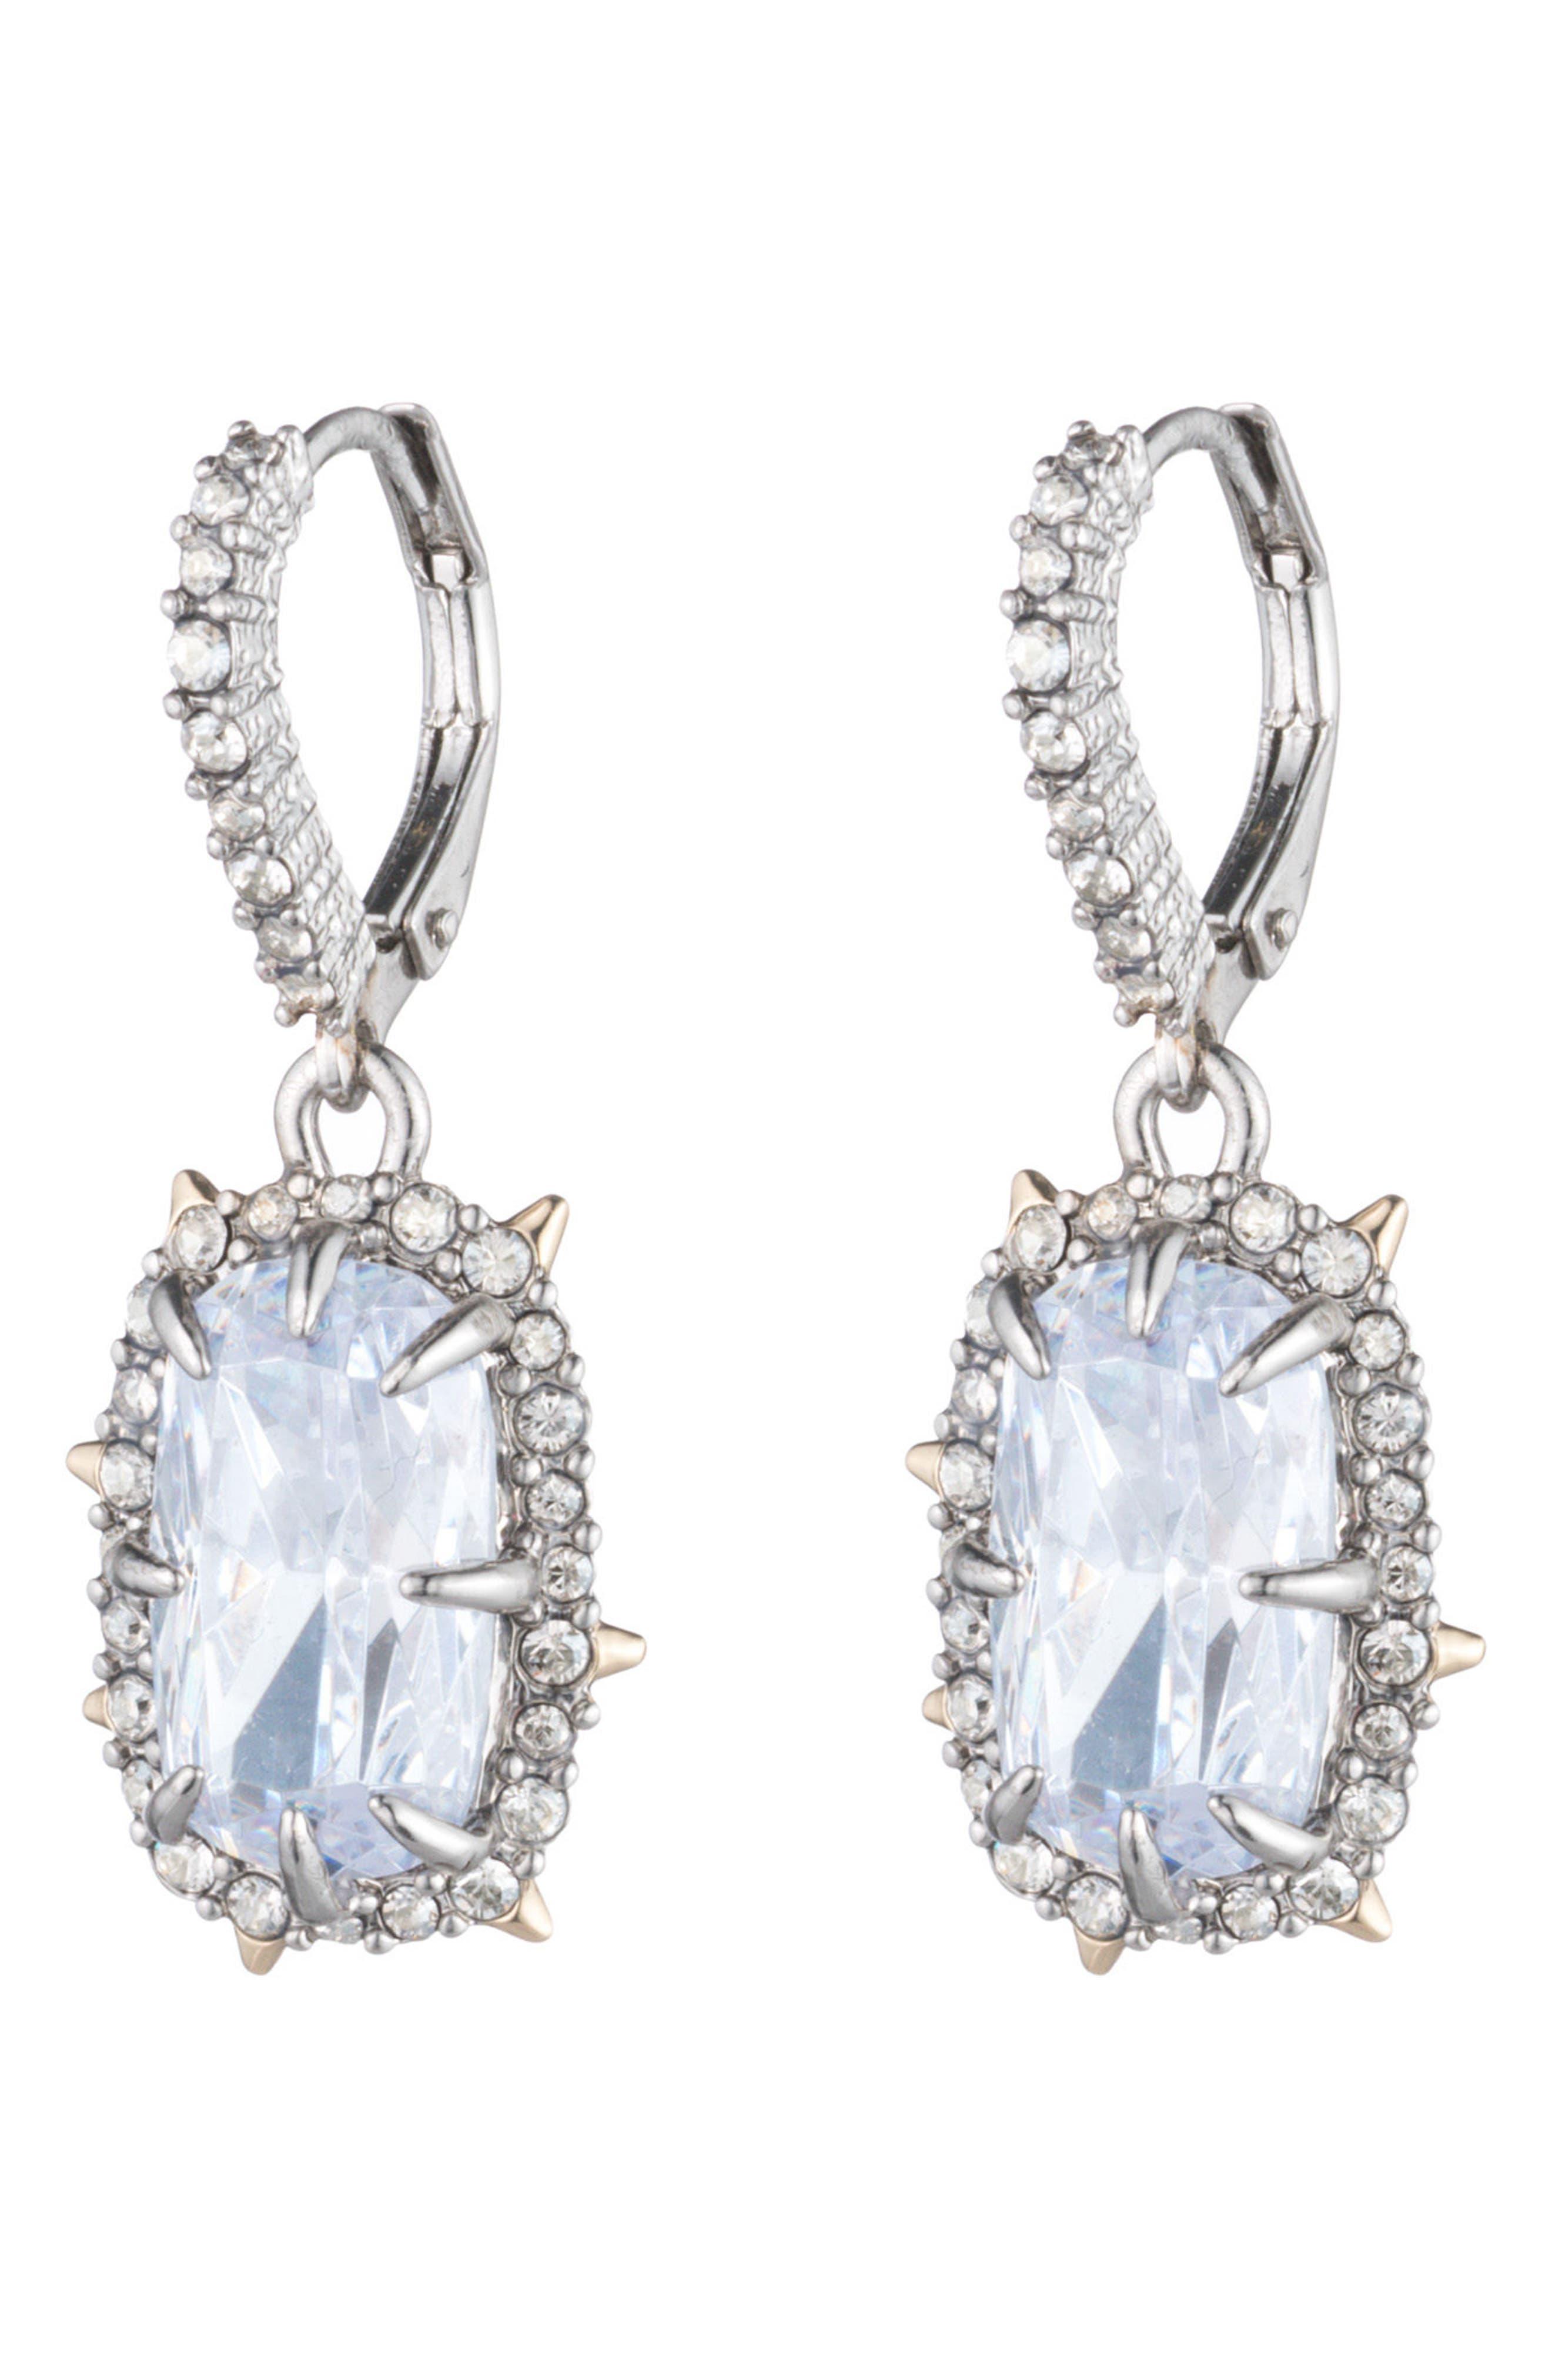 Main Image - Alexis Bittar Swarovski Crystal Drop Earrings